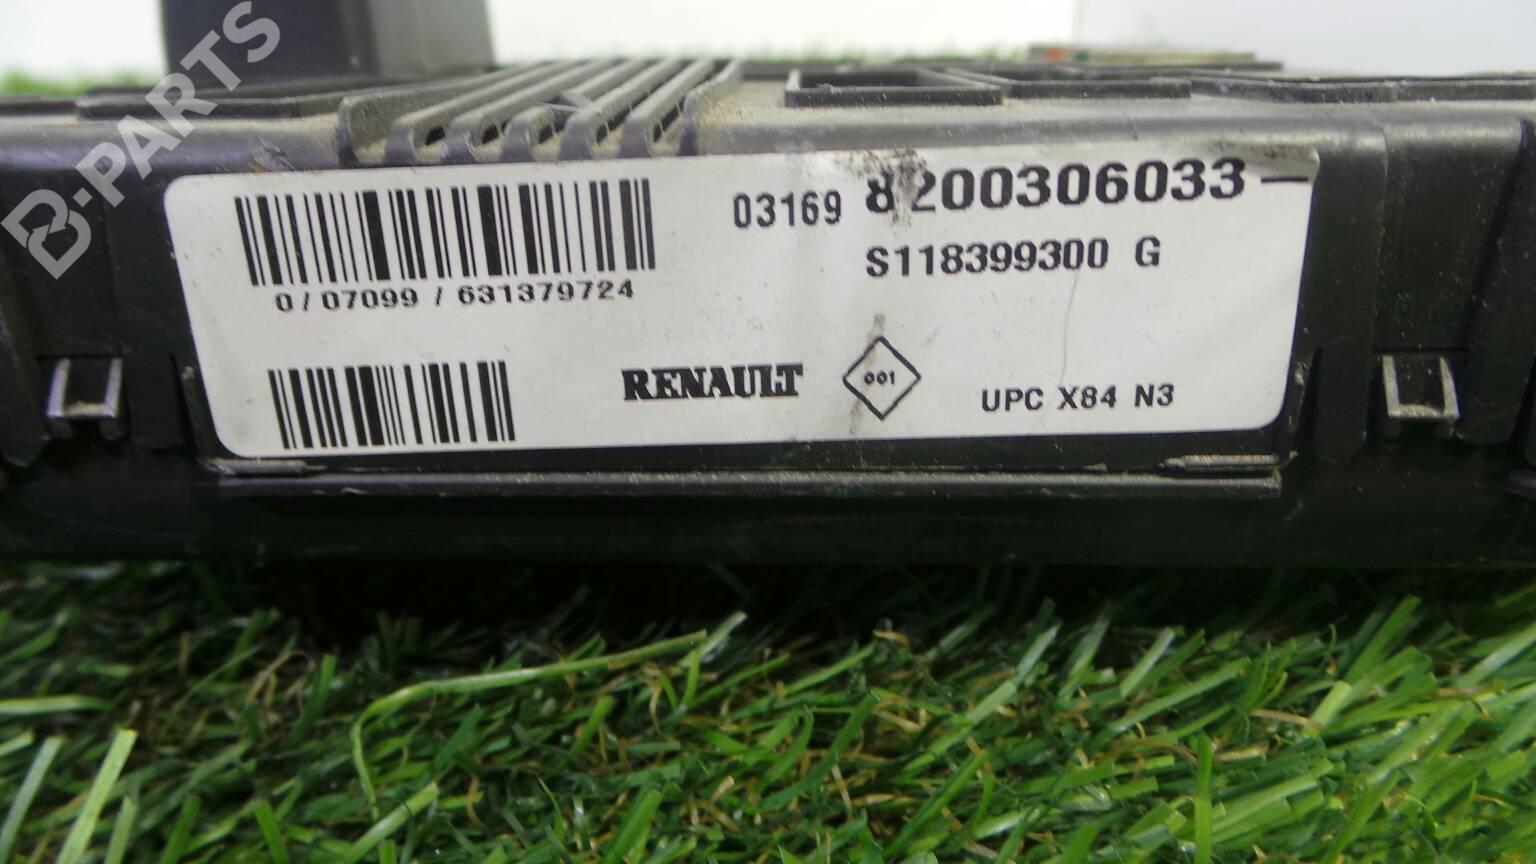 Fuse Box Renault Megane Ii Bm0 1 Cm0 19 Dci Bm0g Cm0g 1665369 For 8200 306 033